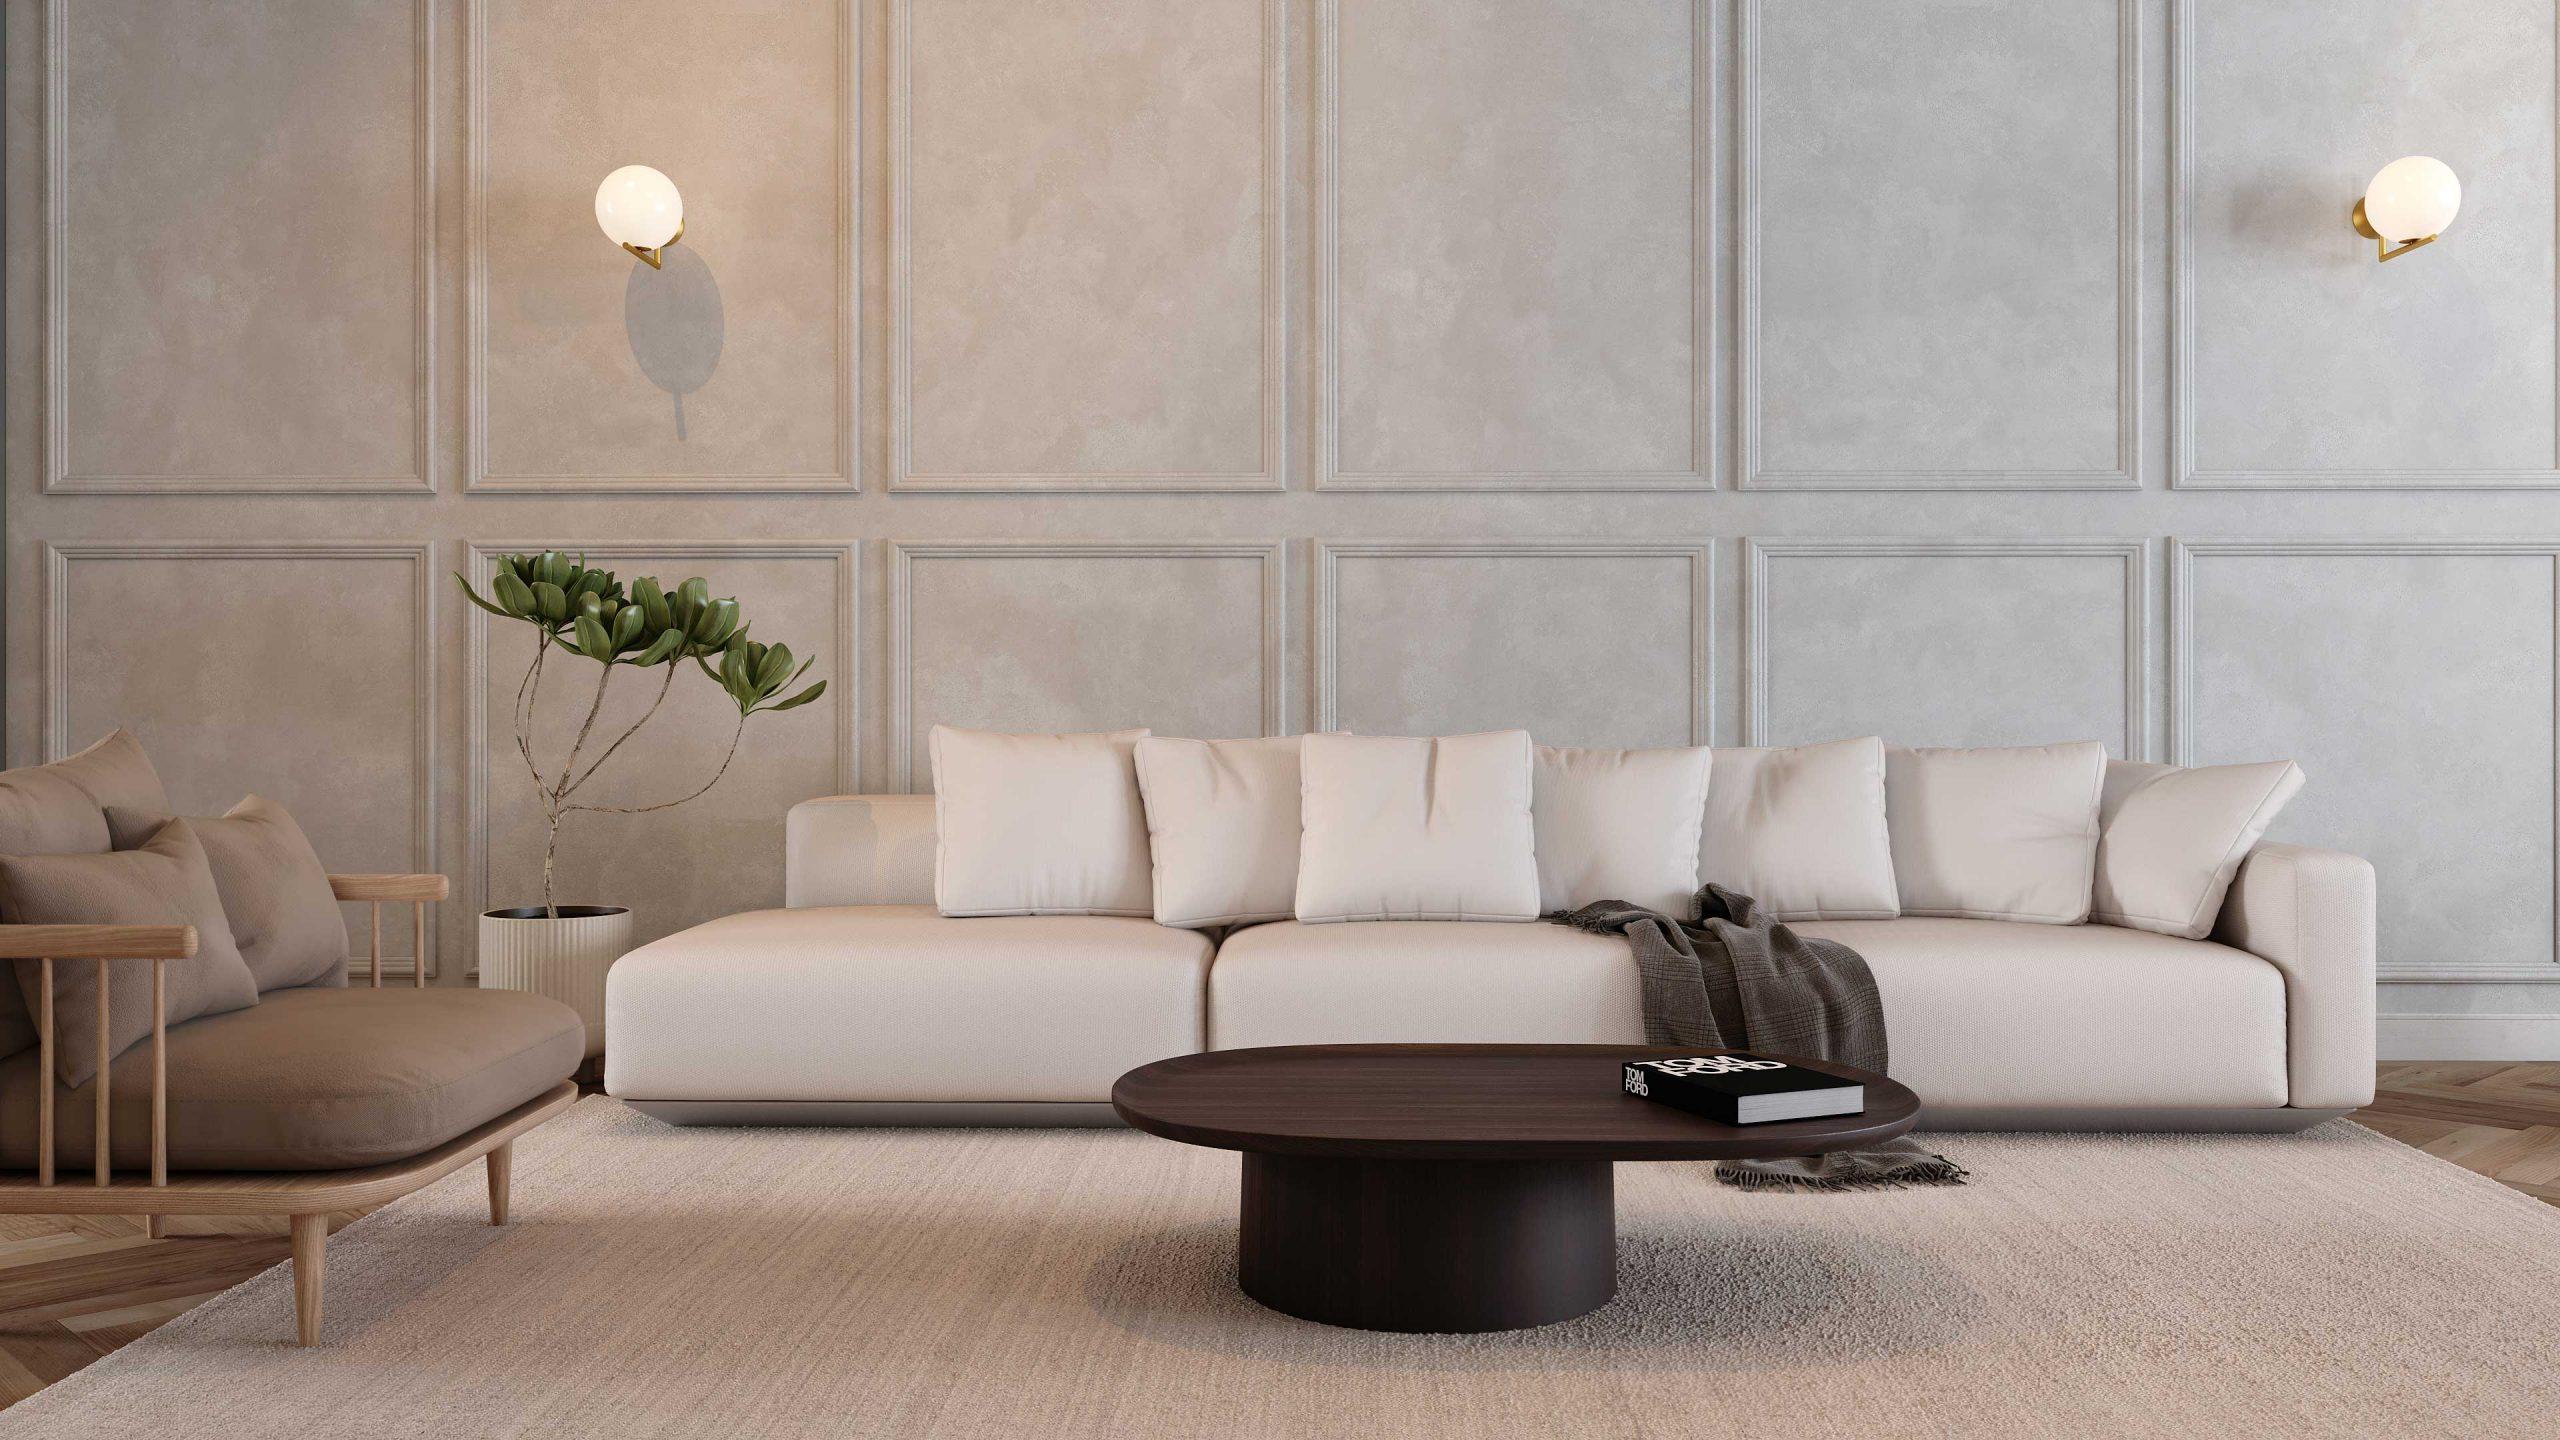 mel interiors residential 3d render